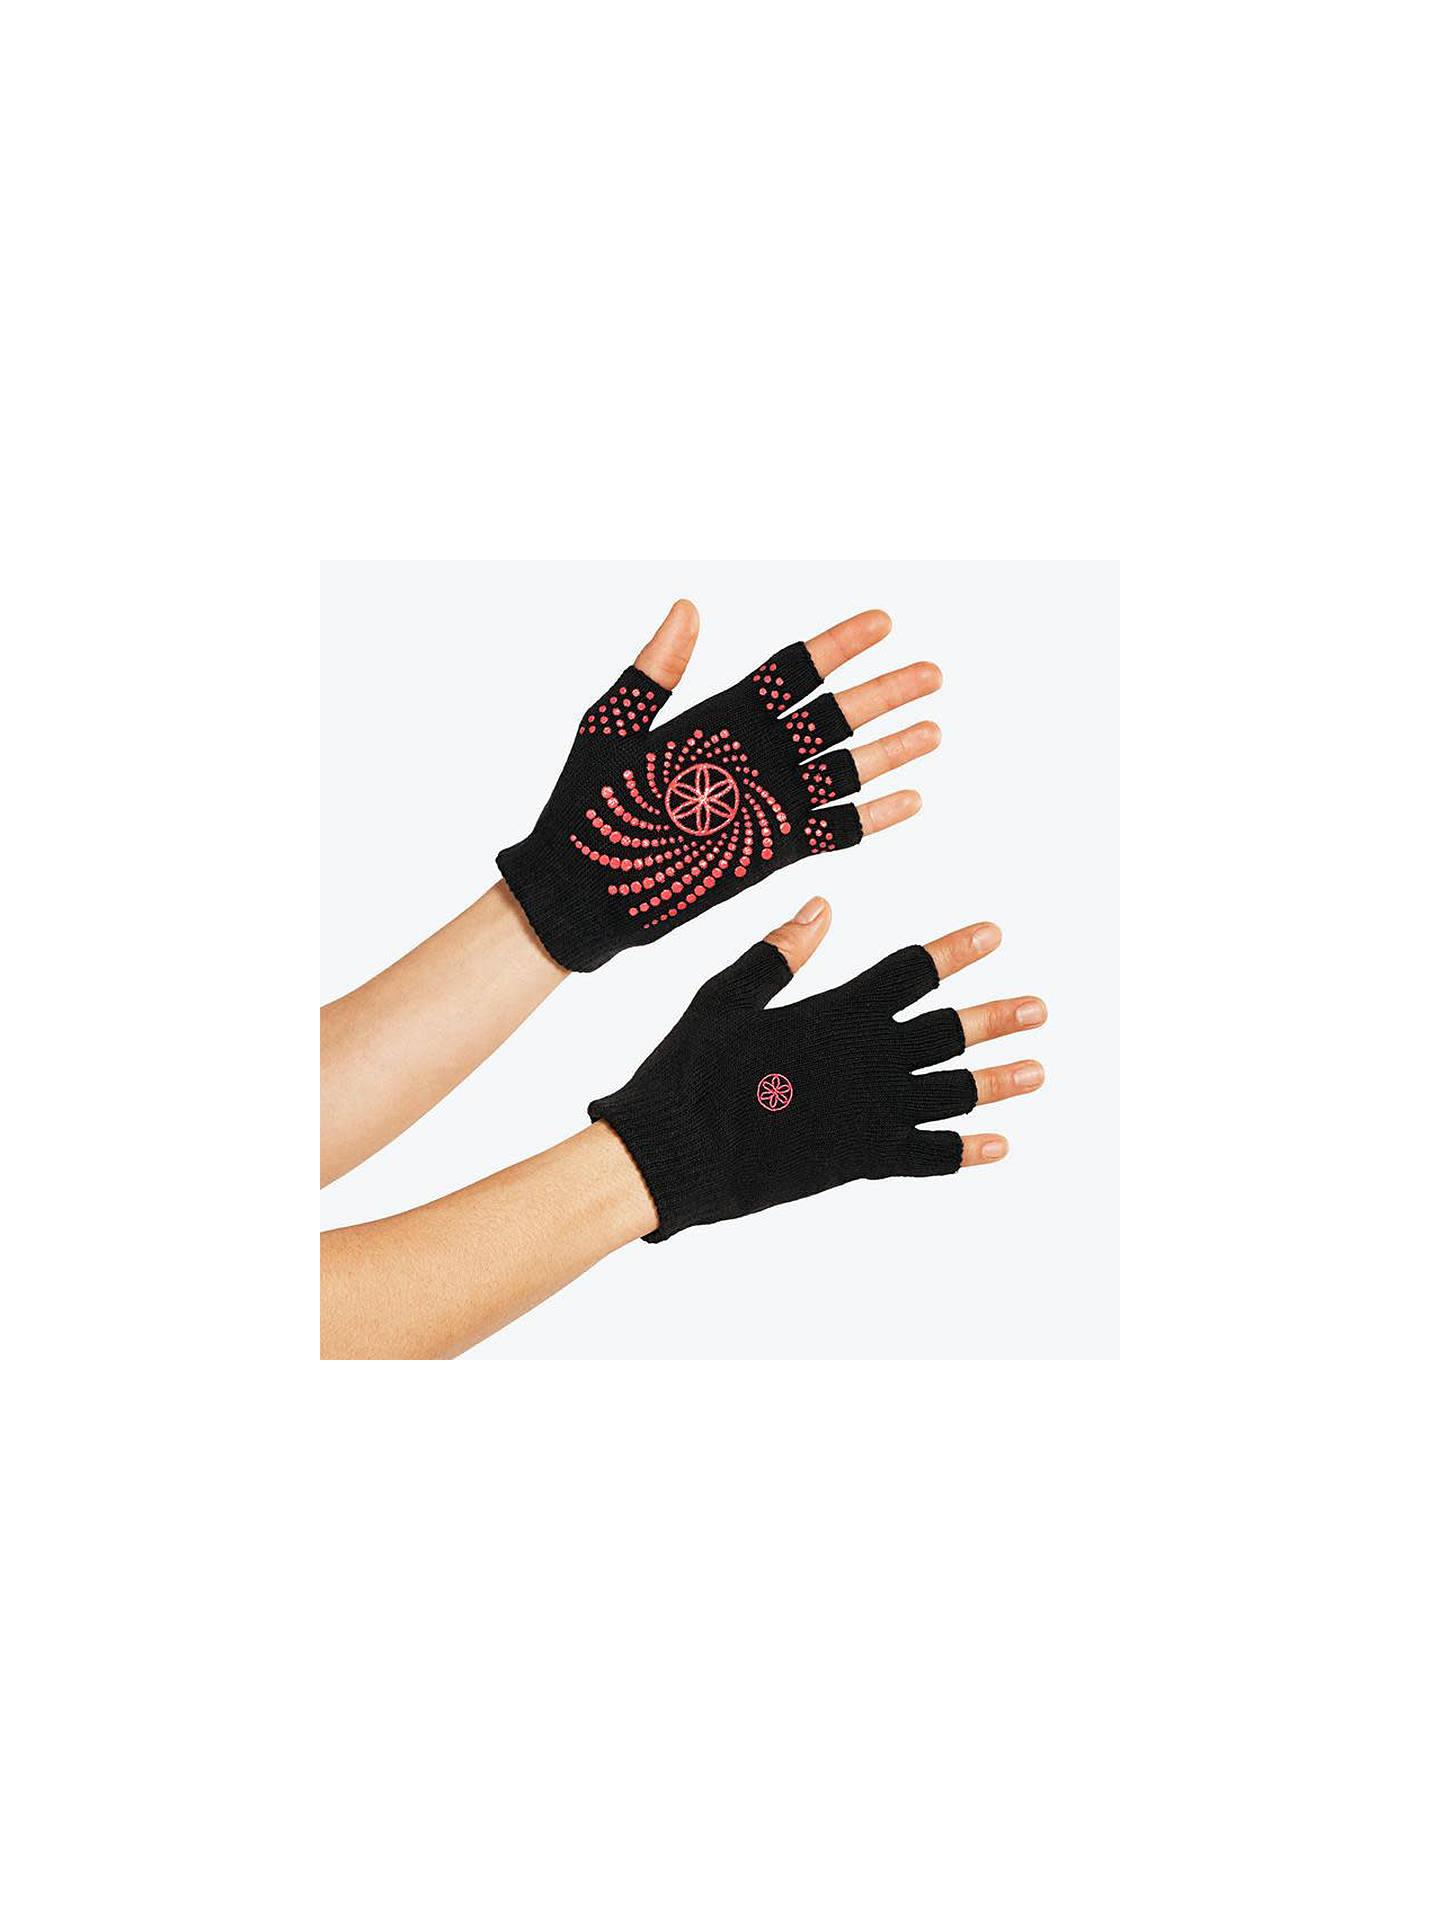 Gaiam Super Grippy Yoga Gloves One Size Black Pink At